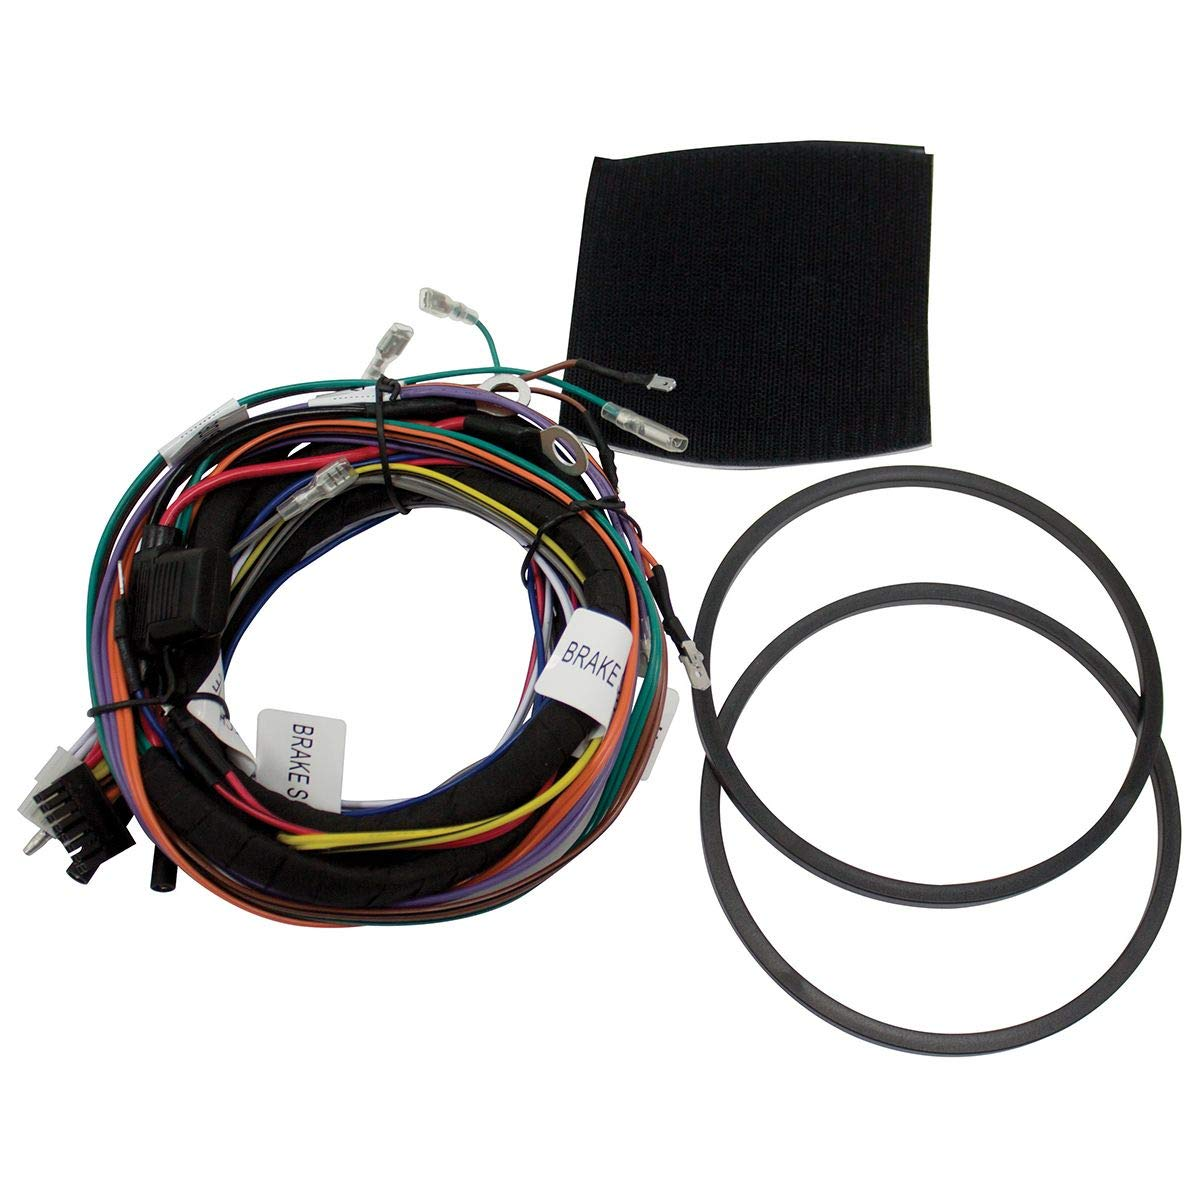 amazon com mtx audio 06 13 harley flhx2 harley audio wiring ignition wiring harness harley wiring harness #4